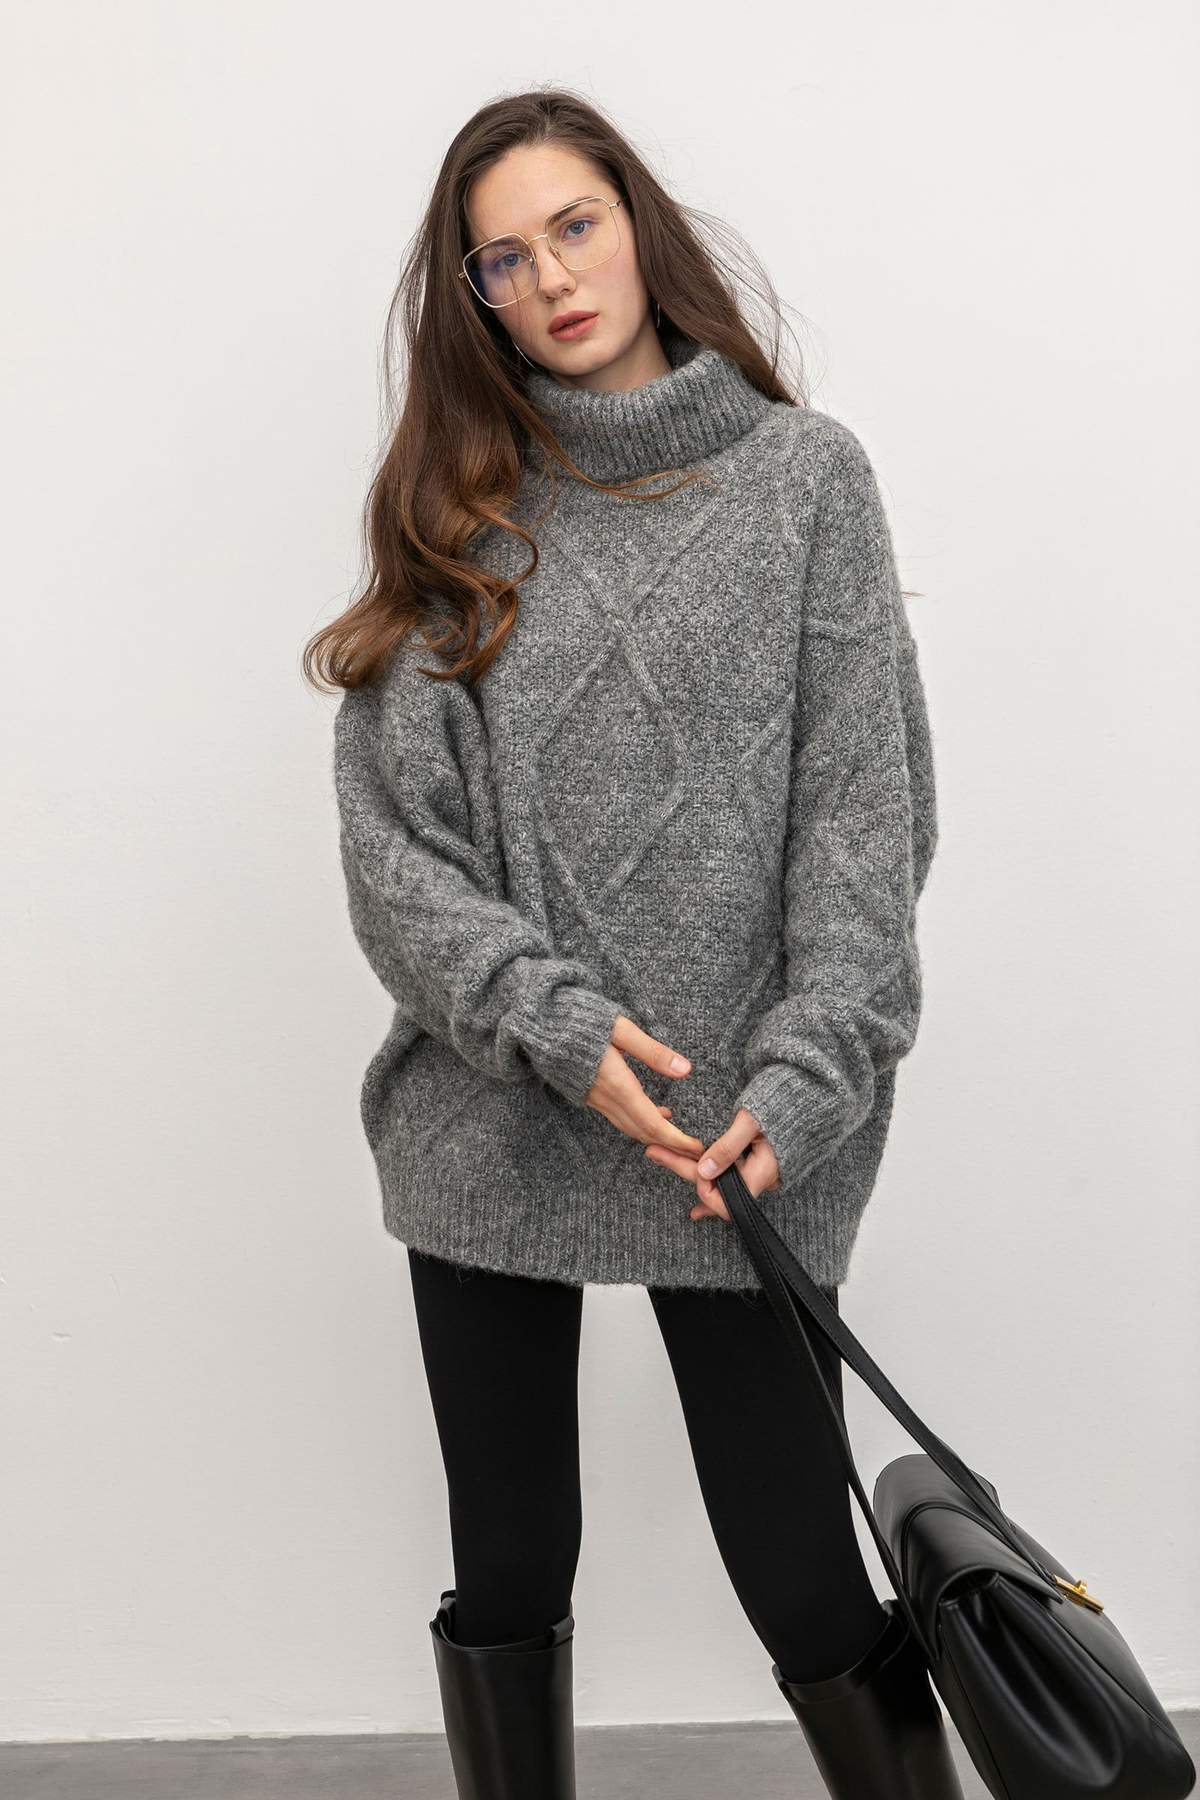 Sabrina Grey Diamond Turtleneck Sweater $37.49